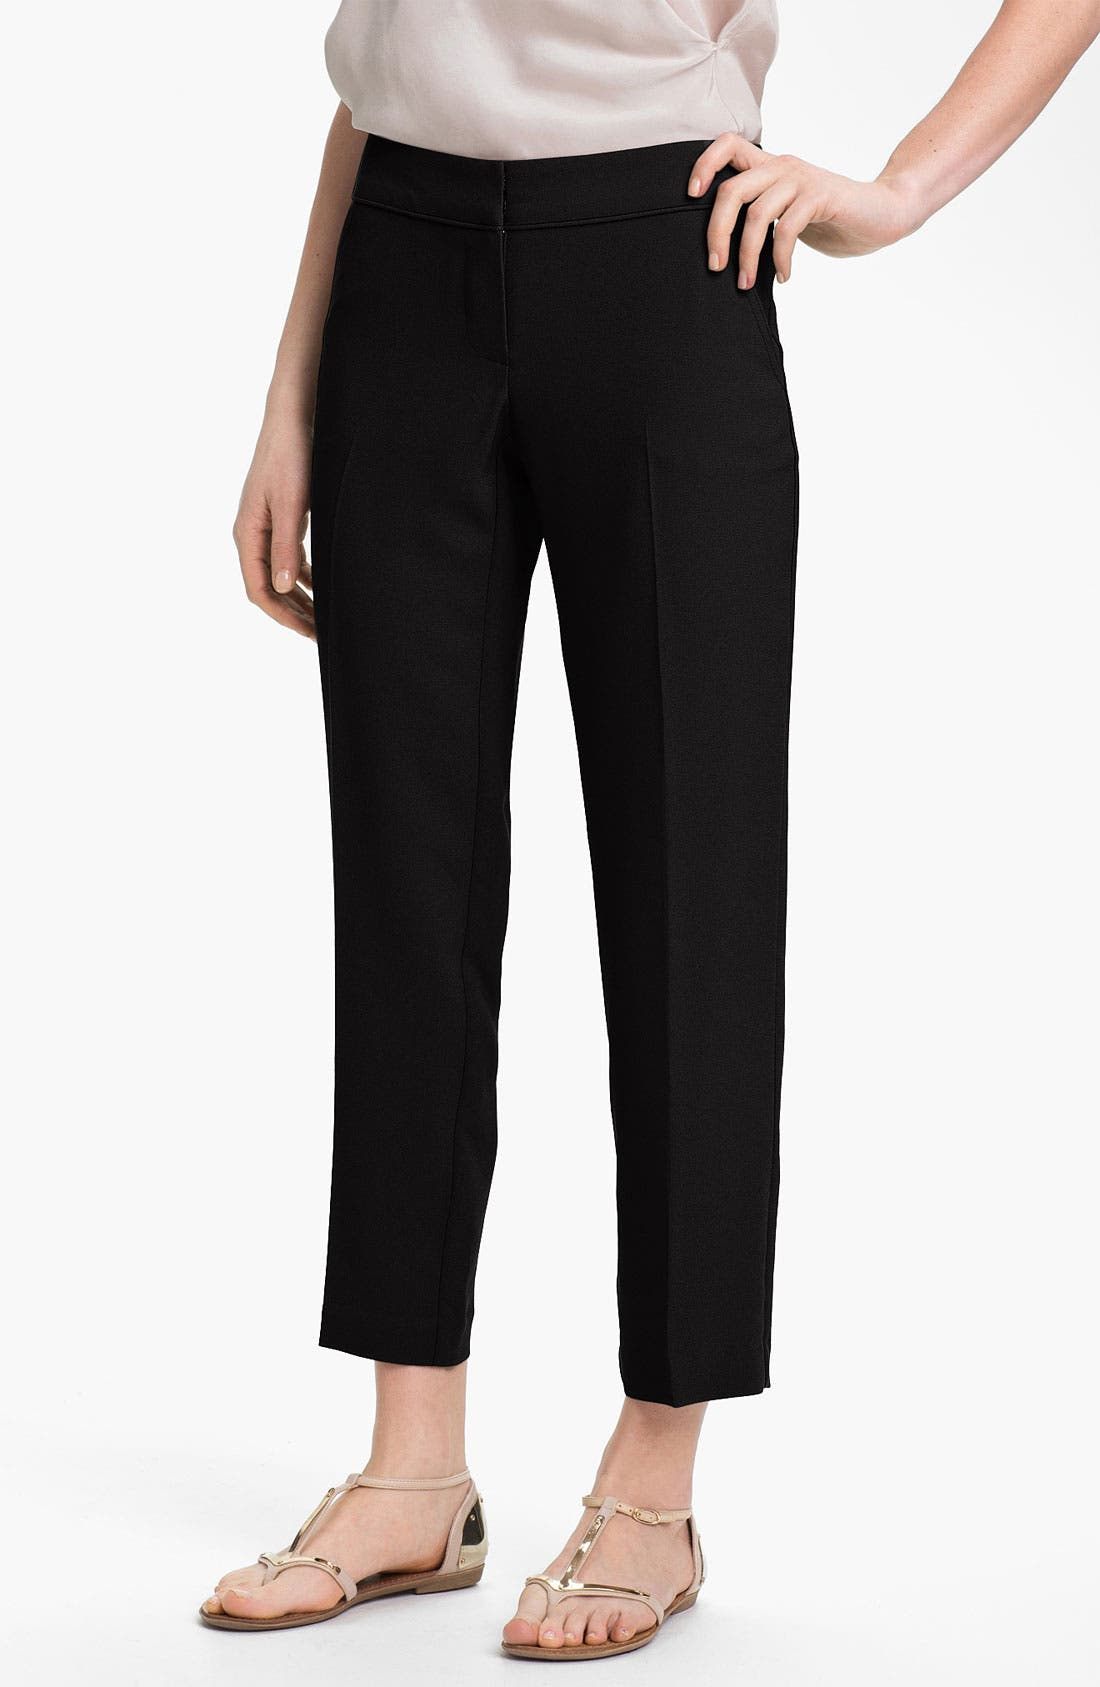 Alternate Image 1 Selected - Trina Turk 'Kameron' Crop Pants